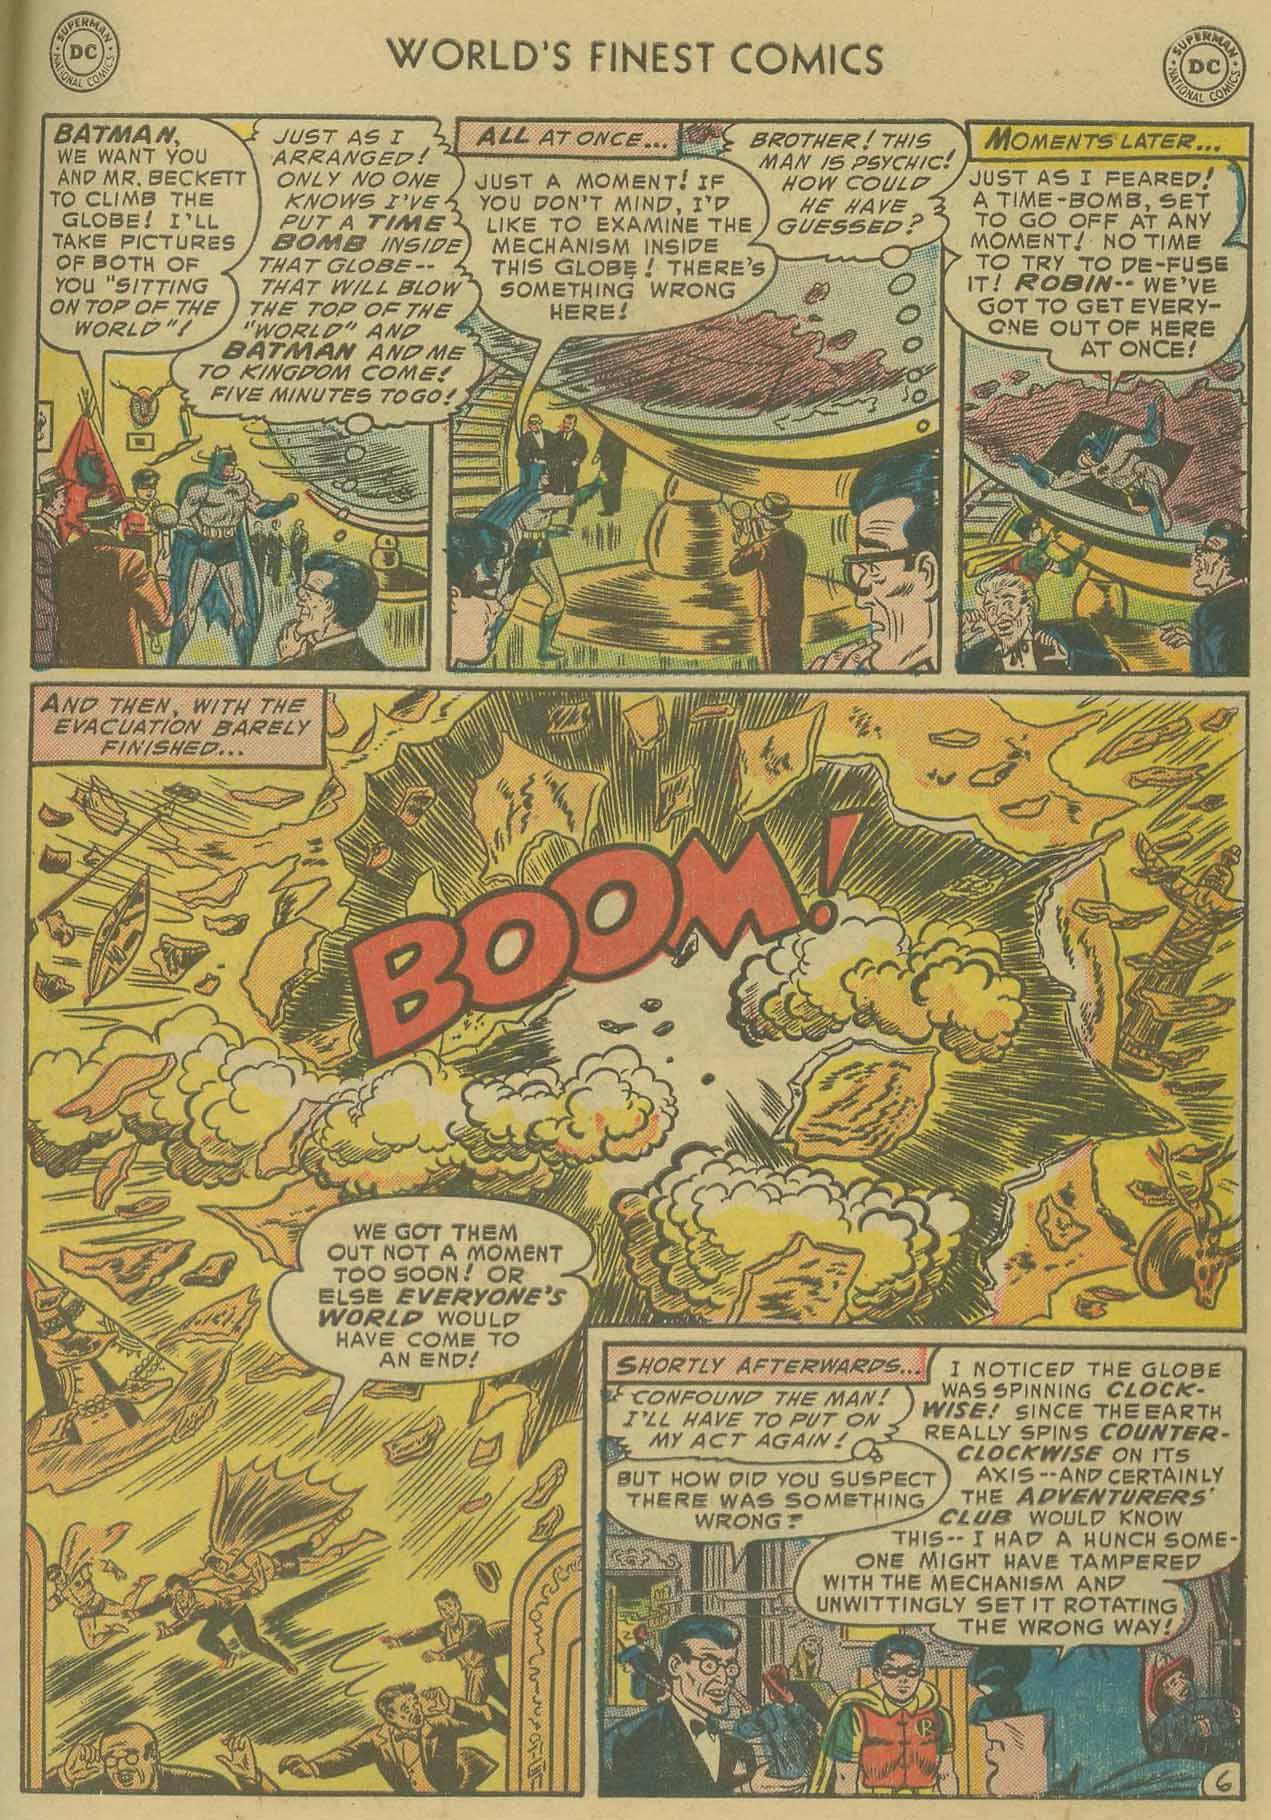 Read online World's Finest Comics comic -  Issue #69 - 59